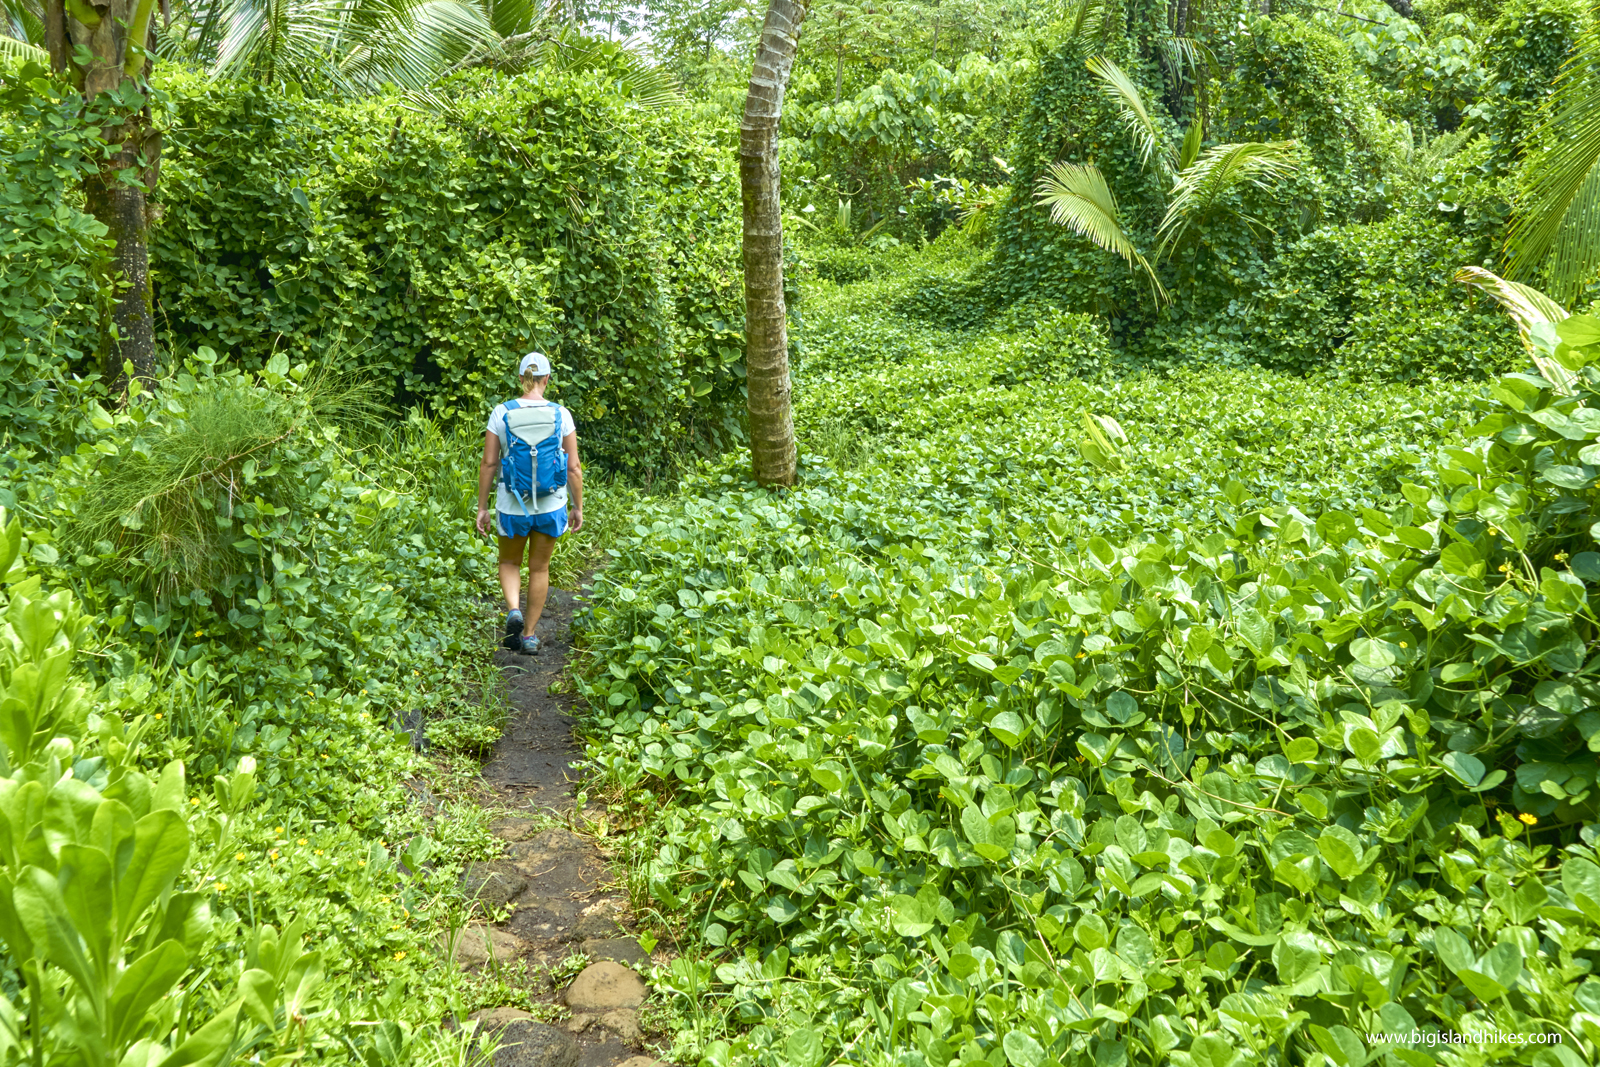 The Puna Trail